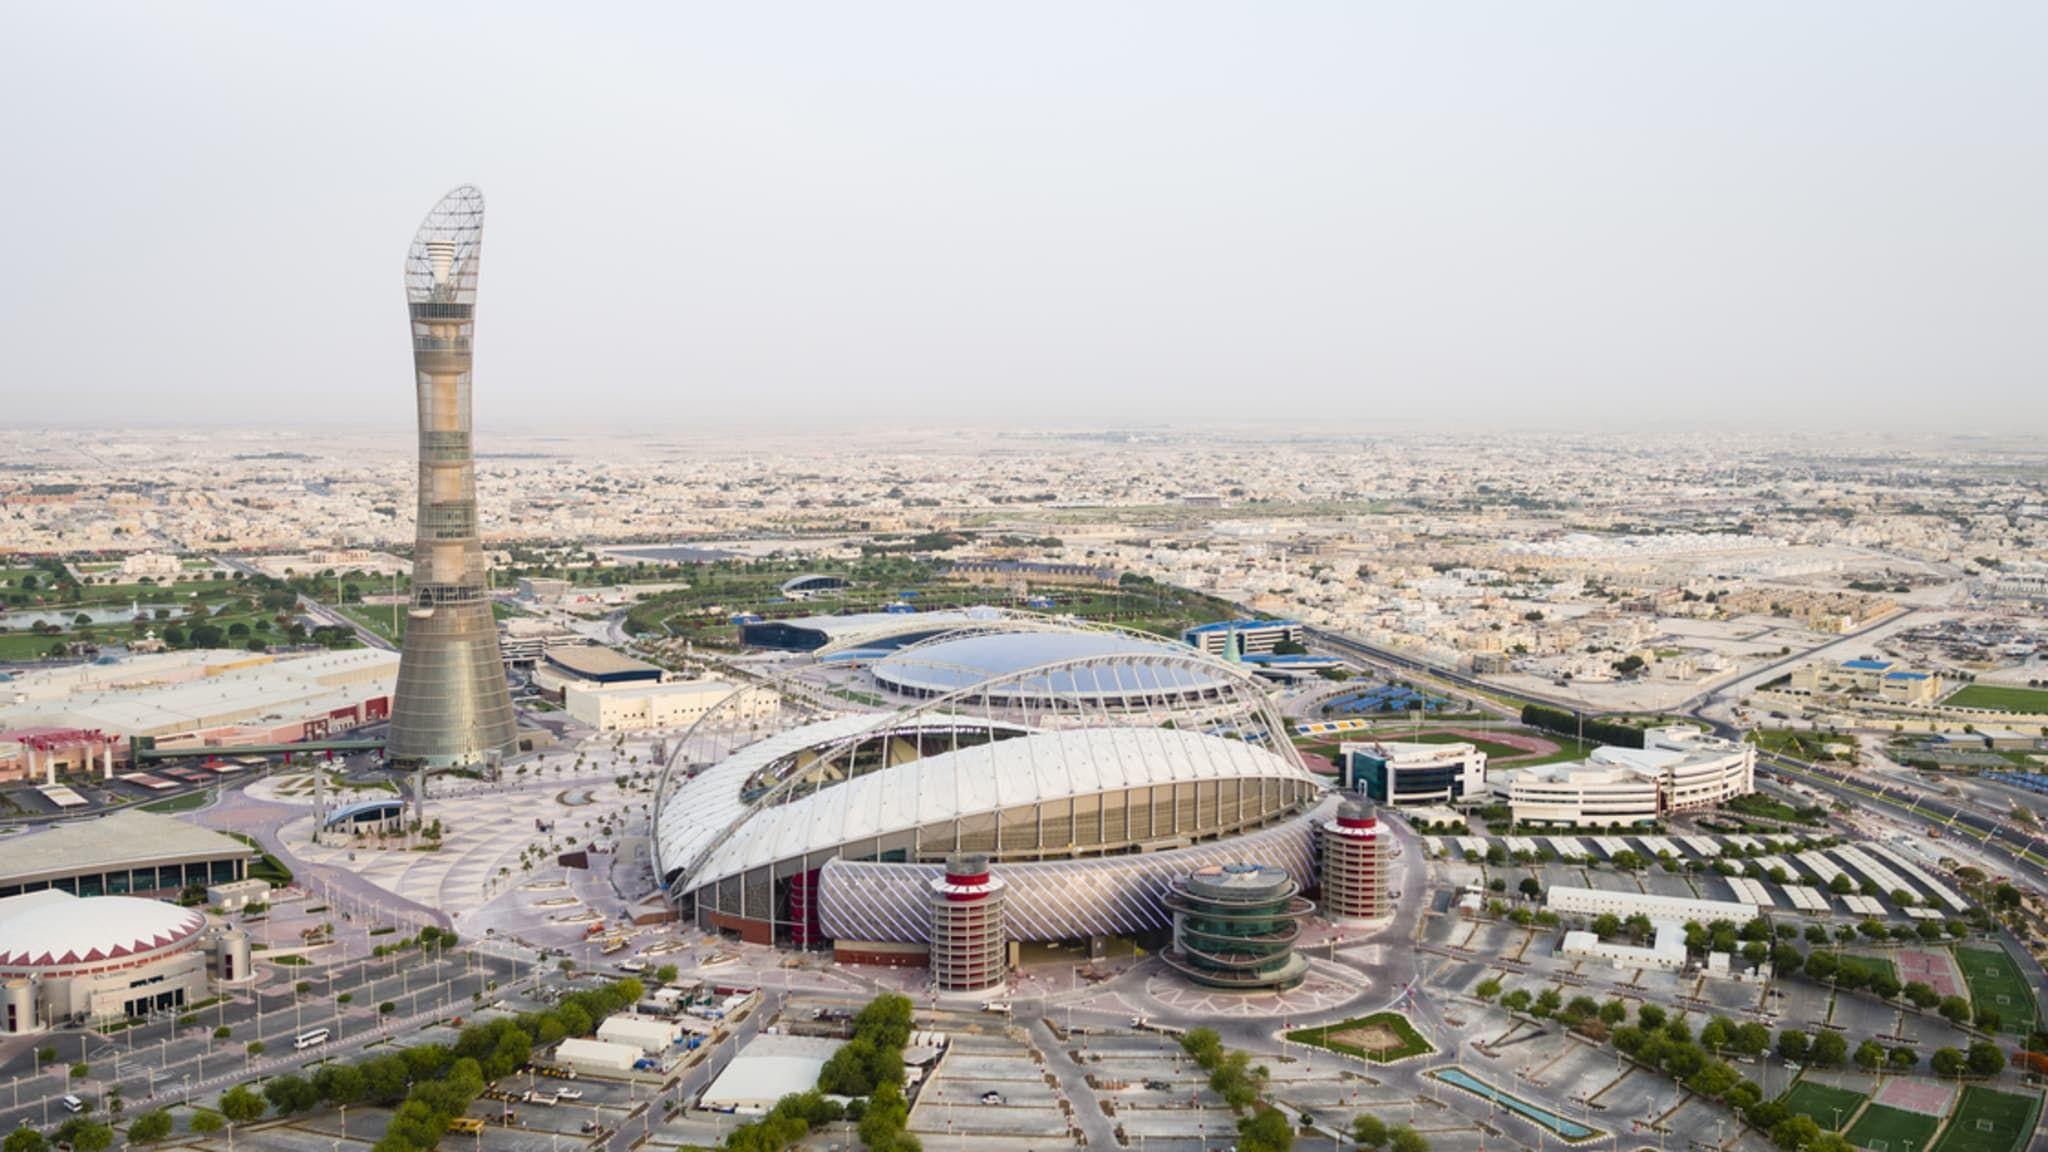 Fifa Club World Cup 2019 News New Fifa Club World Cup Champions To Be Crowned At Khalifa International Stadium Amiral